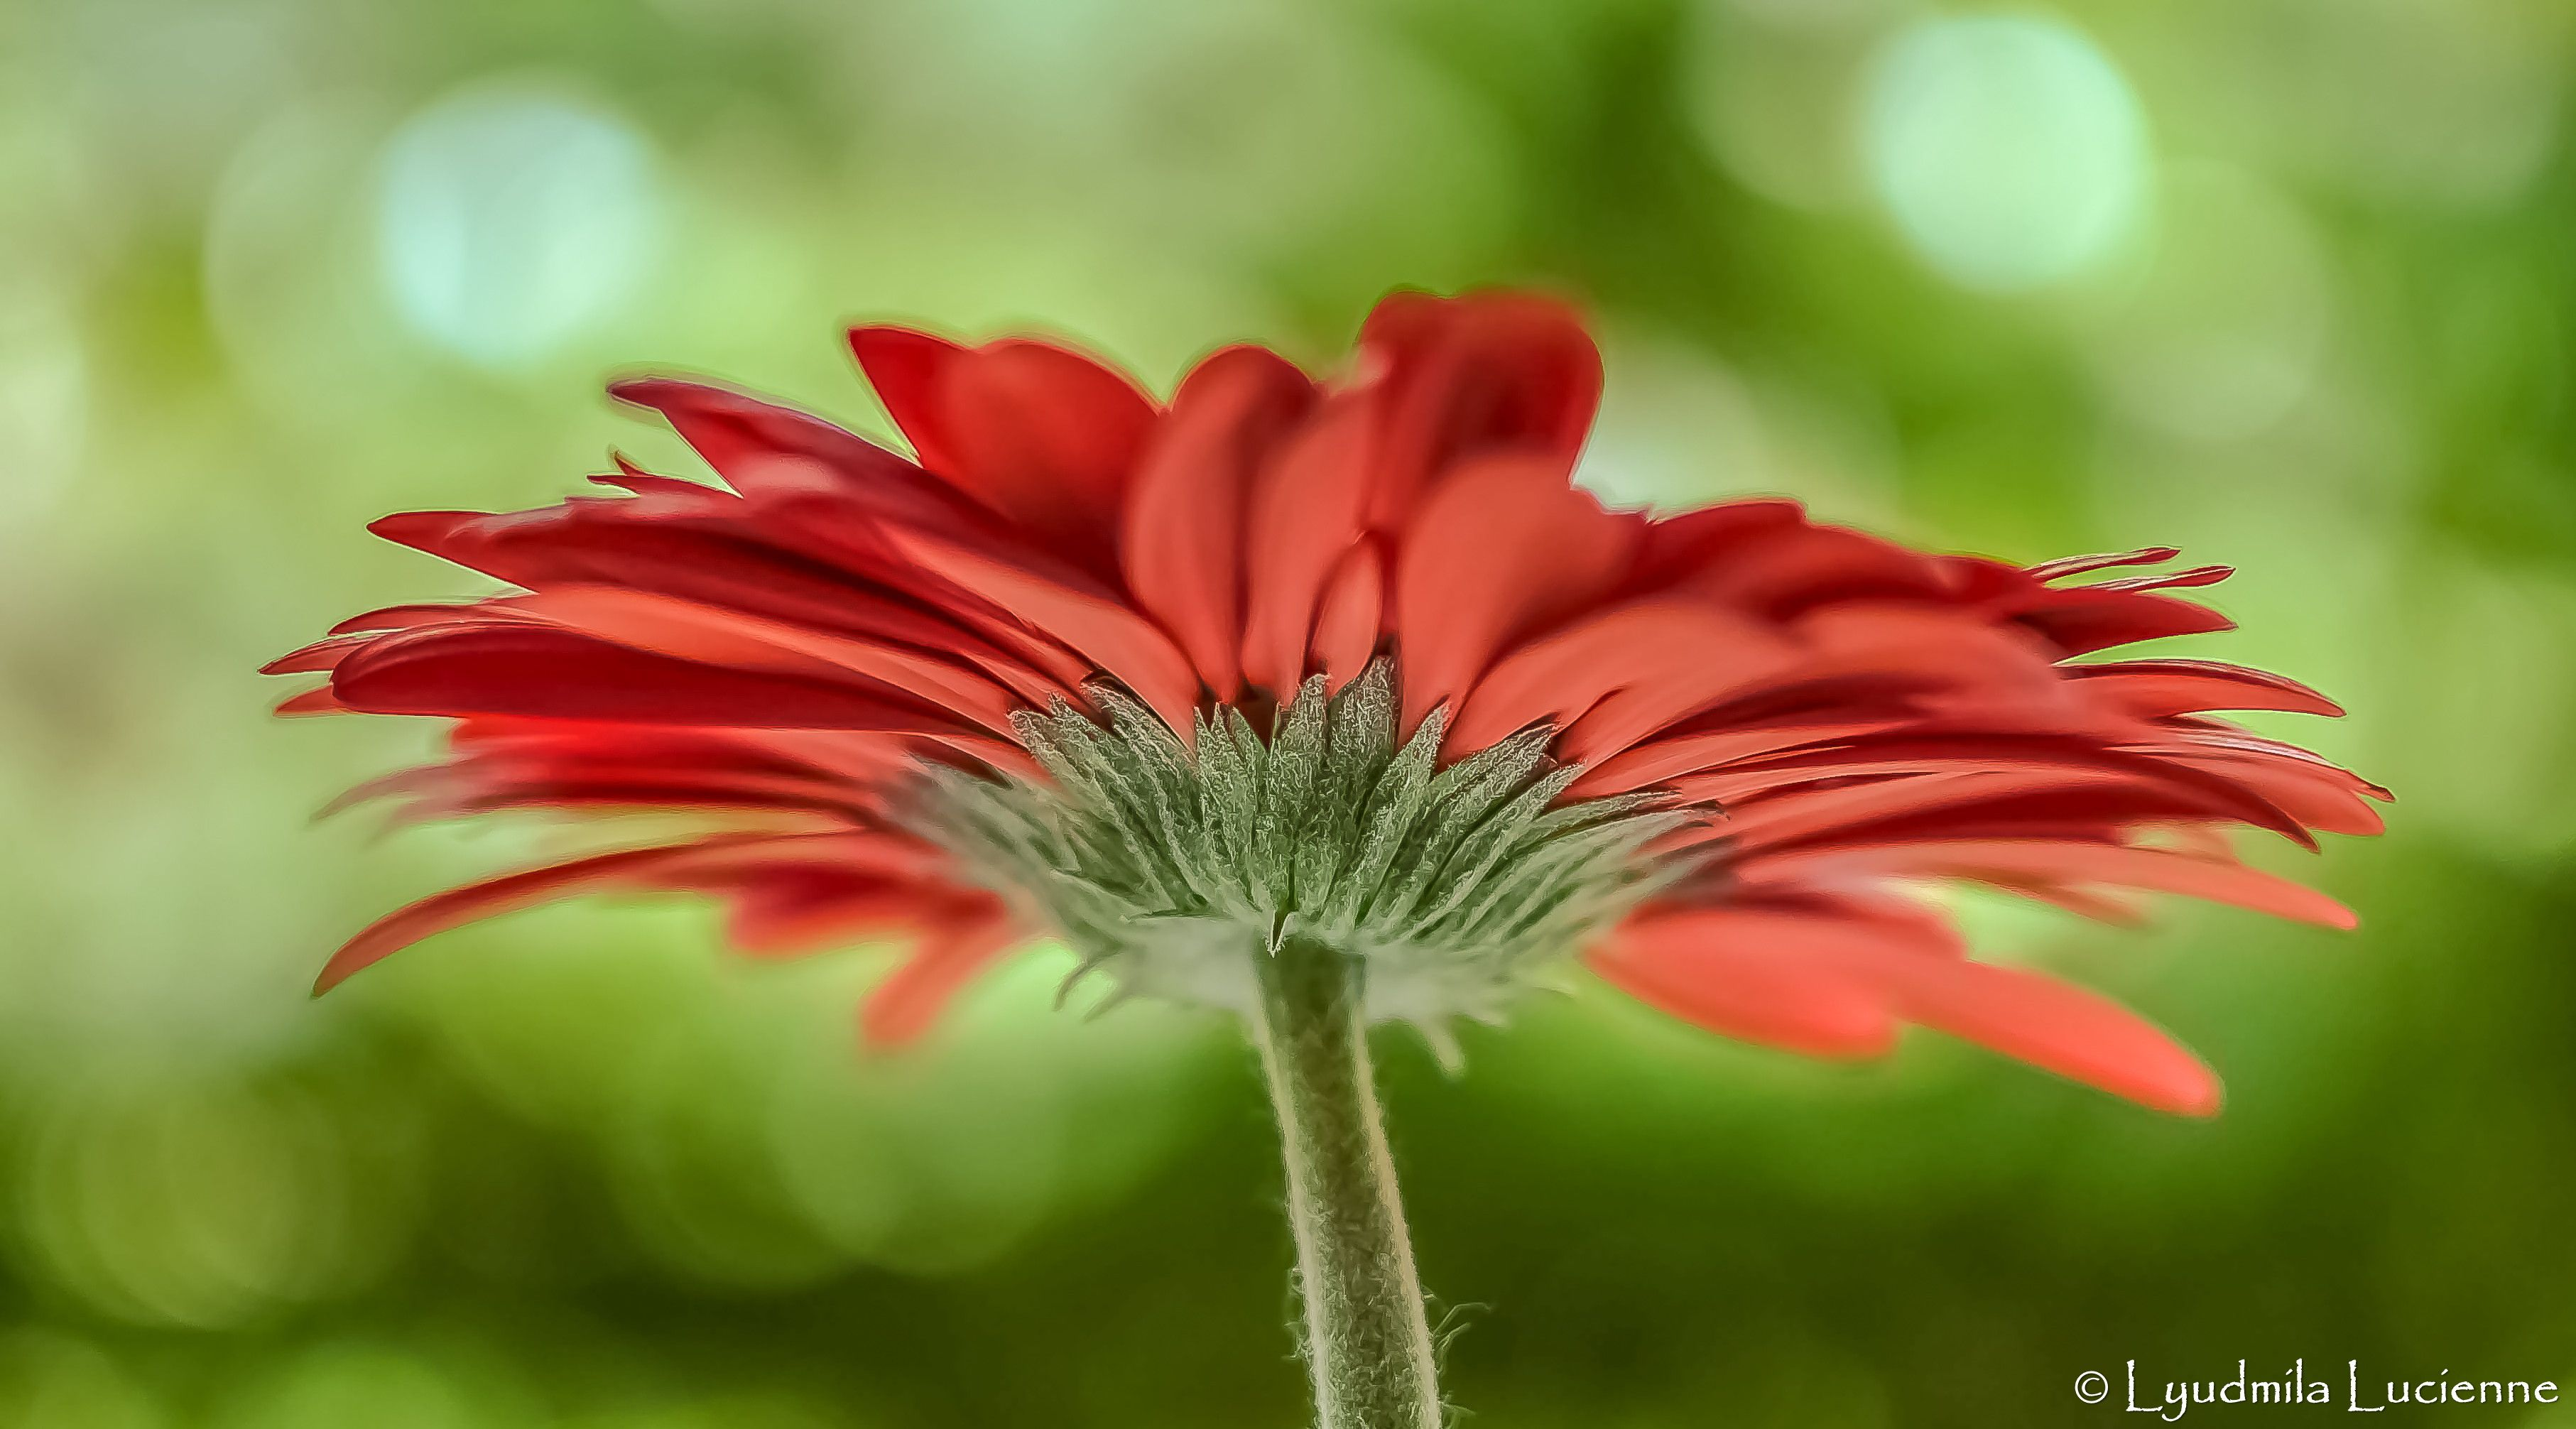 Torch. Факел. #originalcontent #Gerbera #flower #petal #red #stalk ...